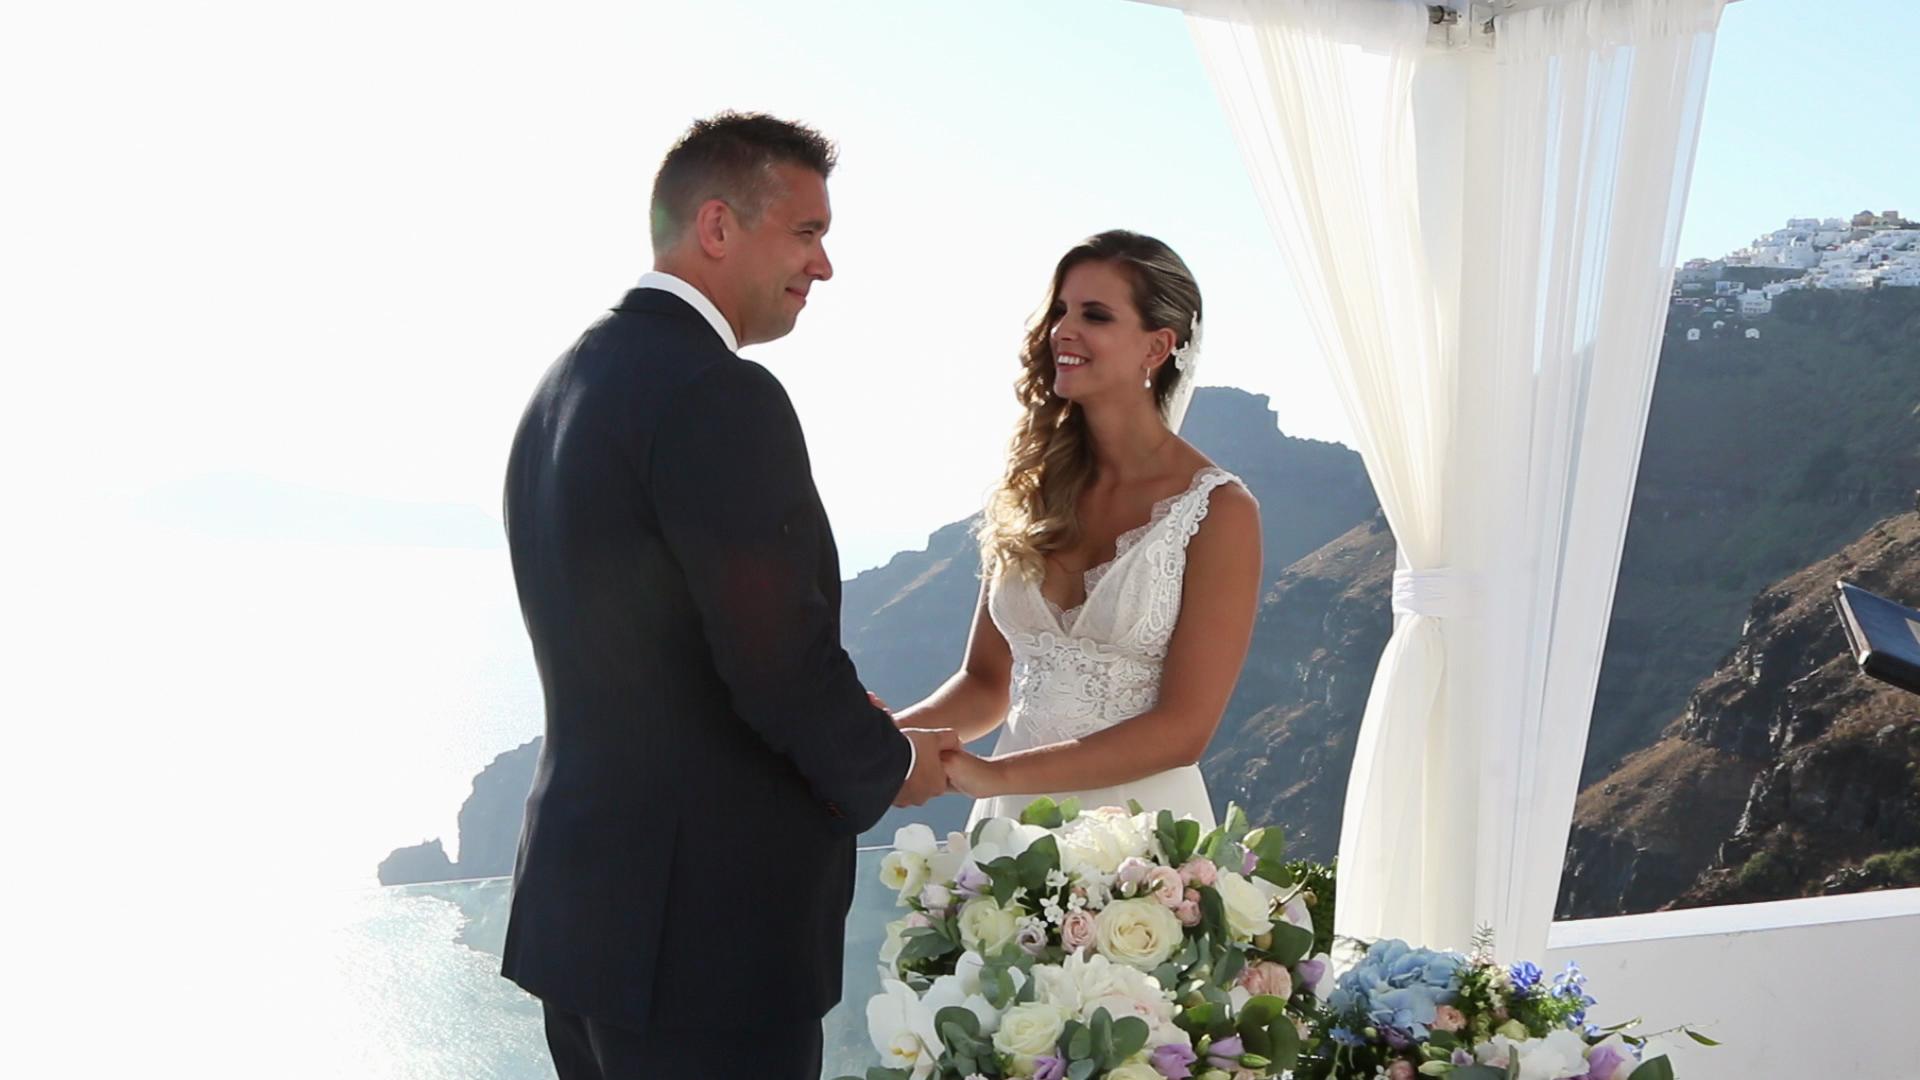 Wedding Videography Santorini - Wedding Vowels